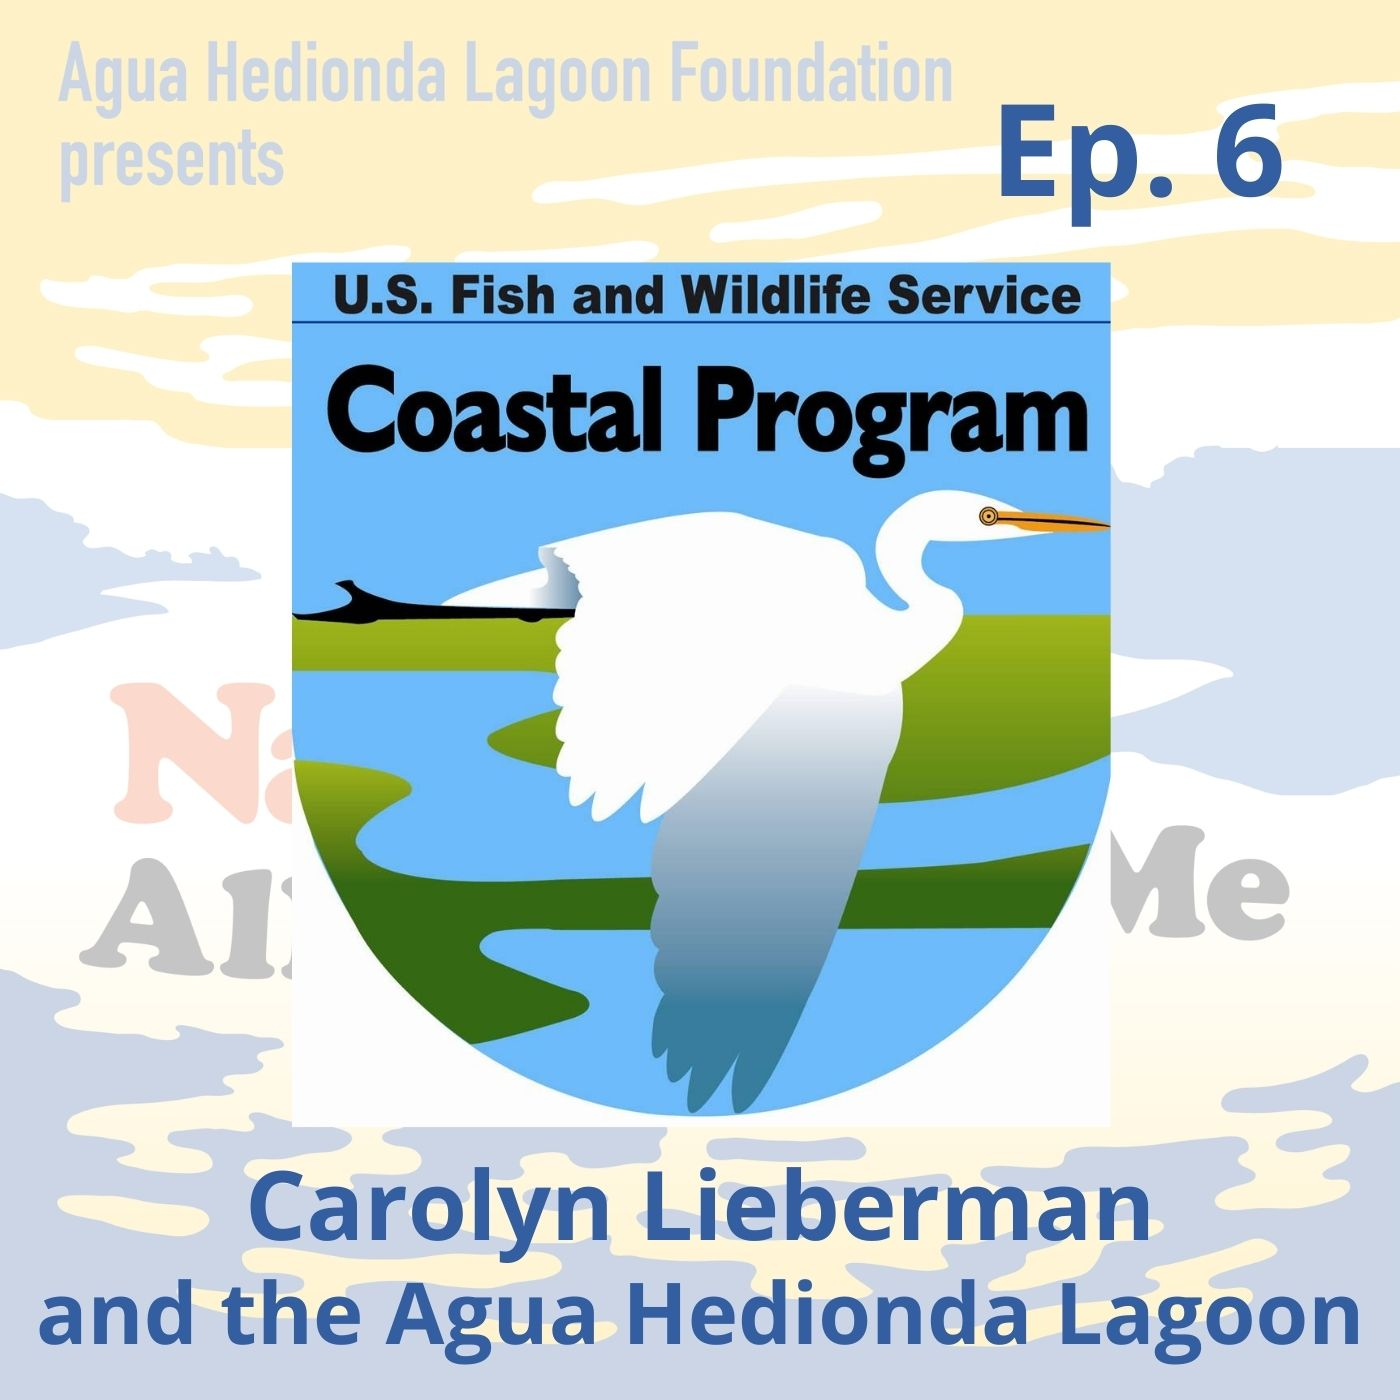 Ep. 6 Carolyn Lieberman: US Fish & Wildlife and the Agua Hedionda Lagoon